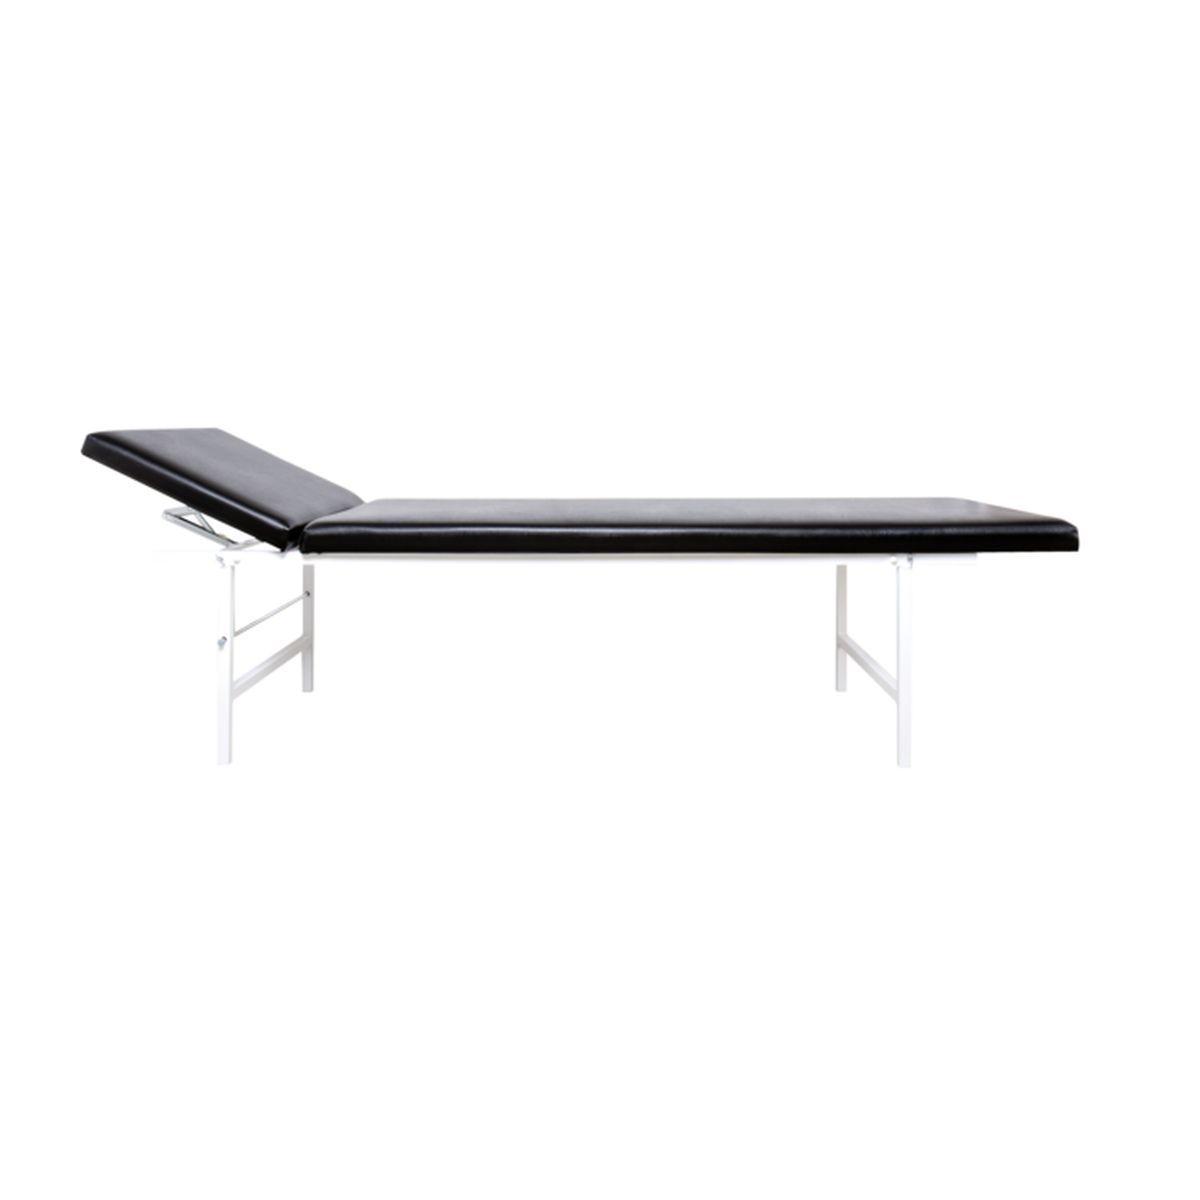 ruheraumliege stahlrohr kopfteil verstellbar terra online. Black Bedroom Furniture Sets. Home Design Ideas